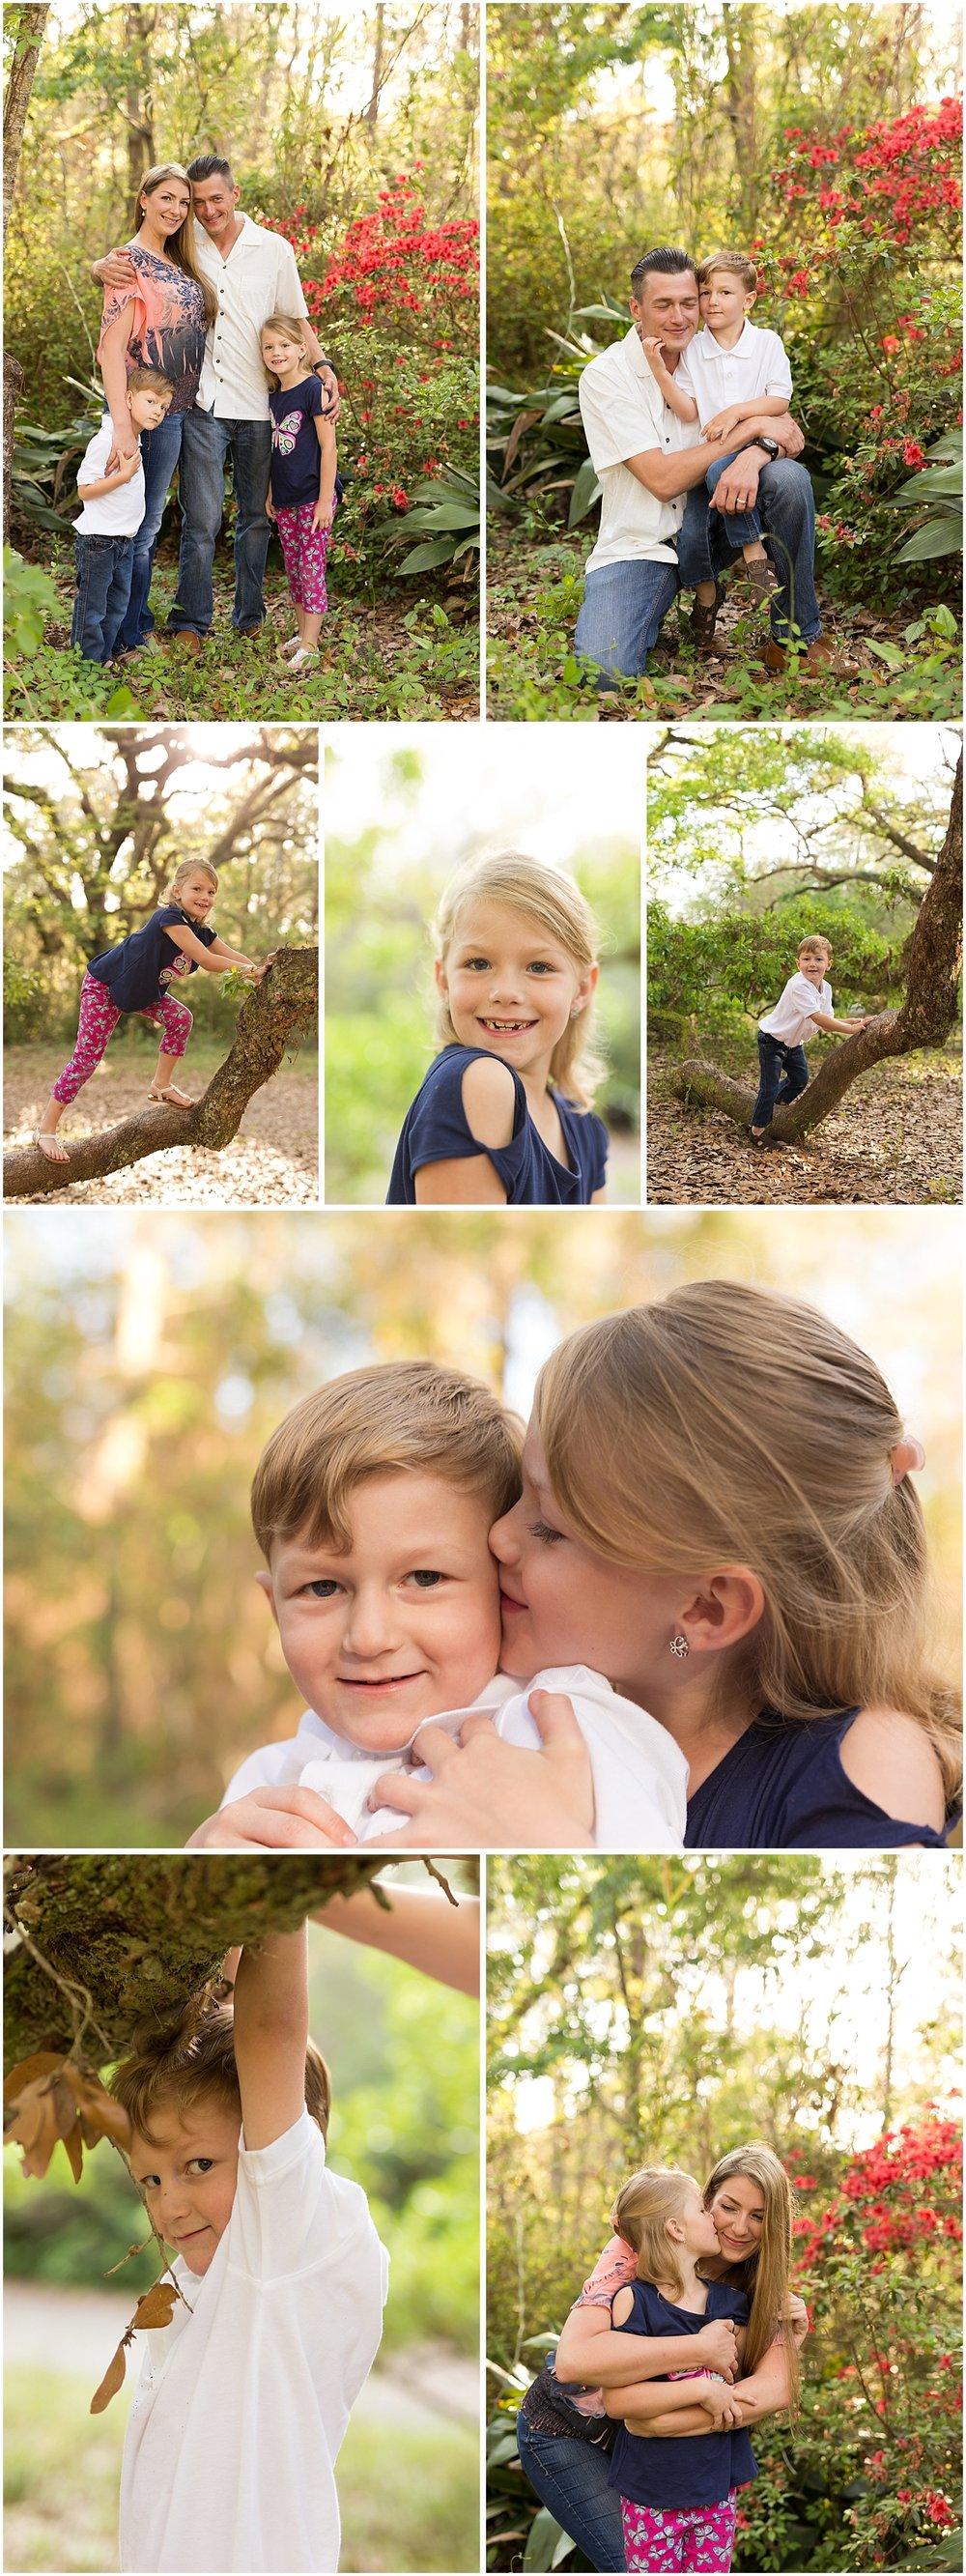 Ocean Springs Family Photographer - Spring family portraits